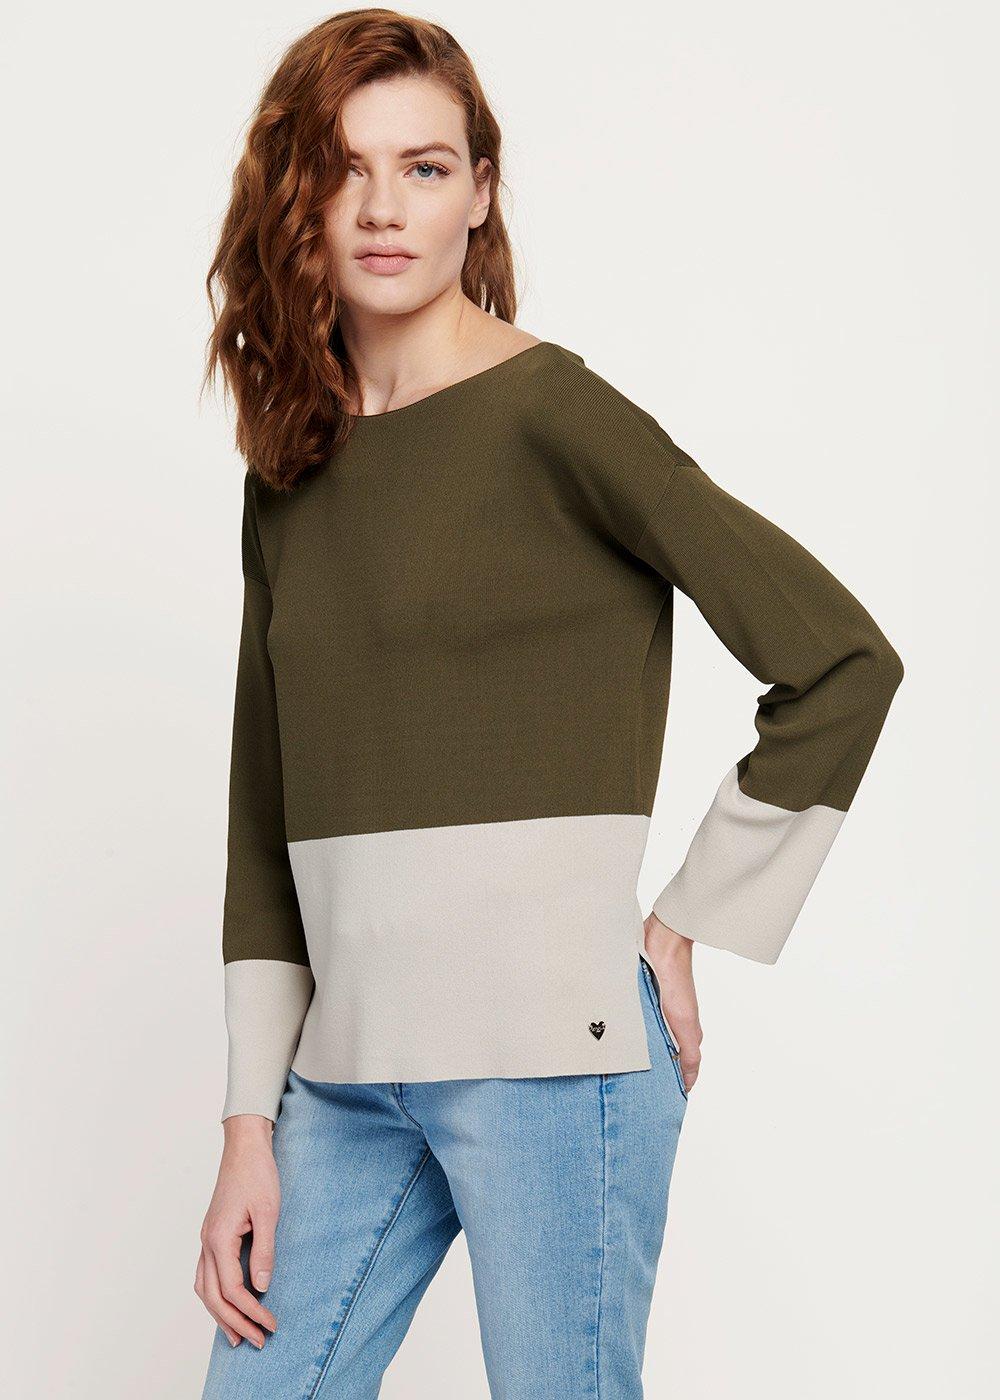 Marilu double-colour cotton yarn sweater - Timo / L.beige - Woman